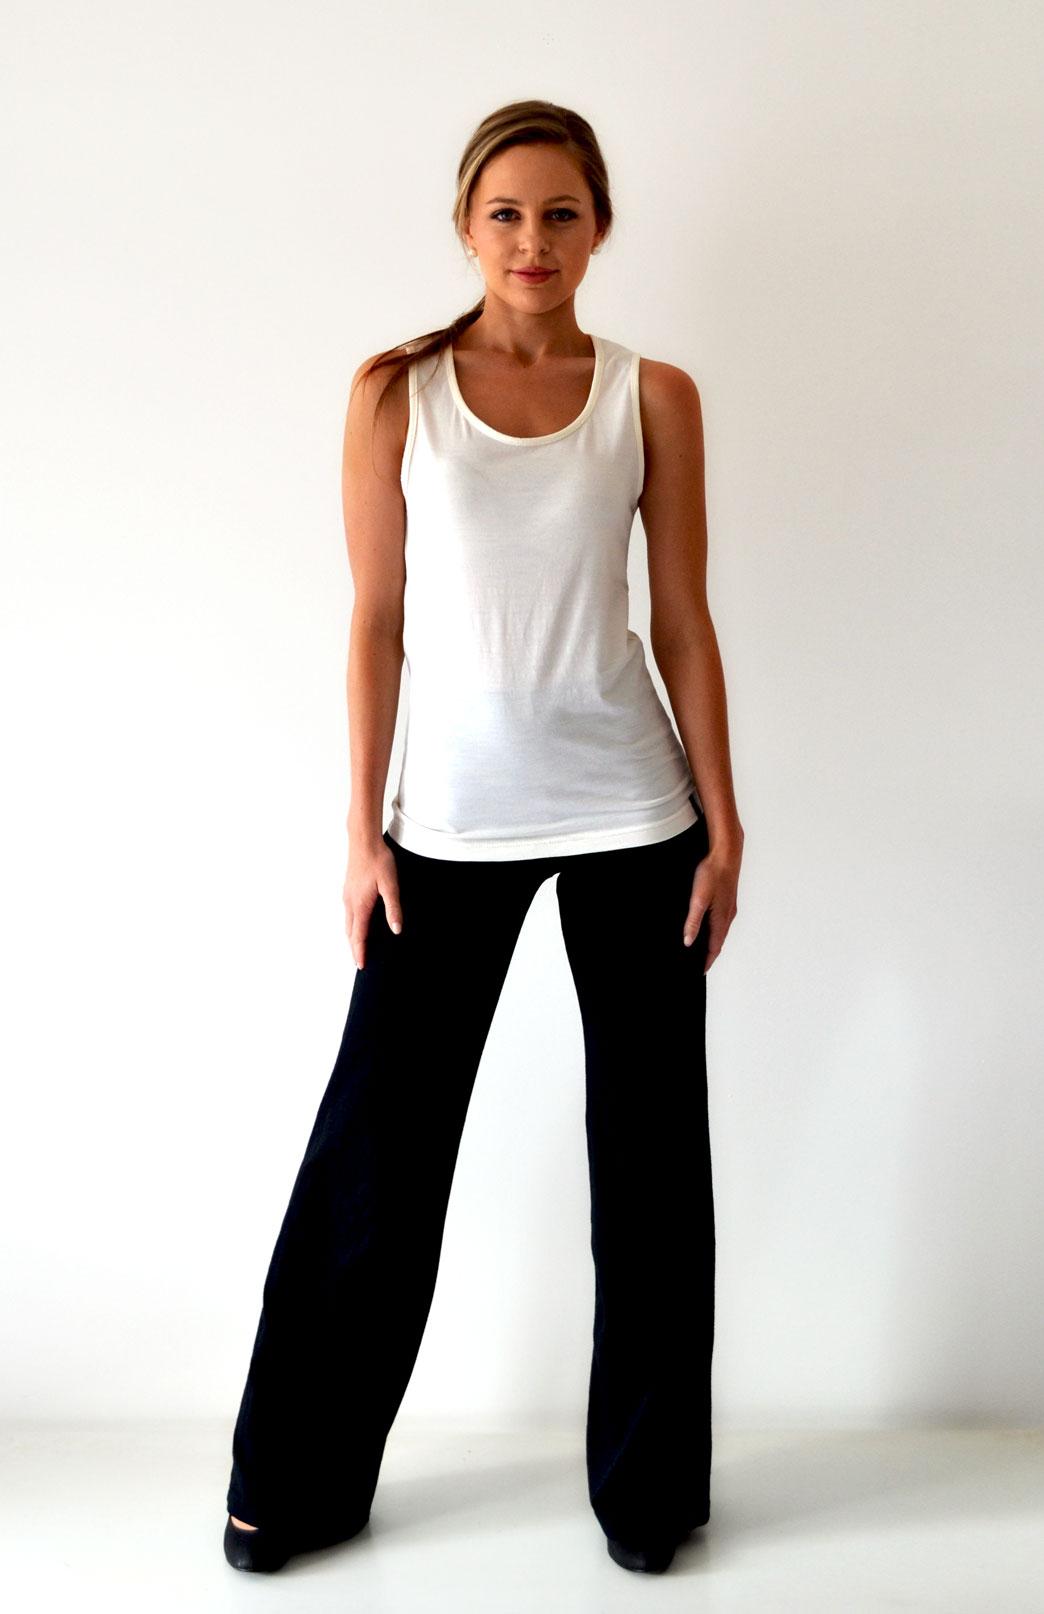 Scoop Neck Top - Sleeveless - Women's Ivory Sleeveless Scoop Neck Wool Top - Smitten Merino Tasmania Australia